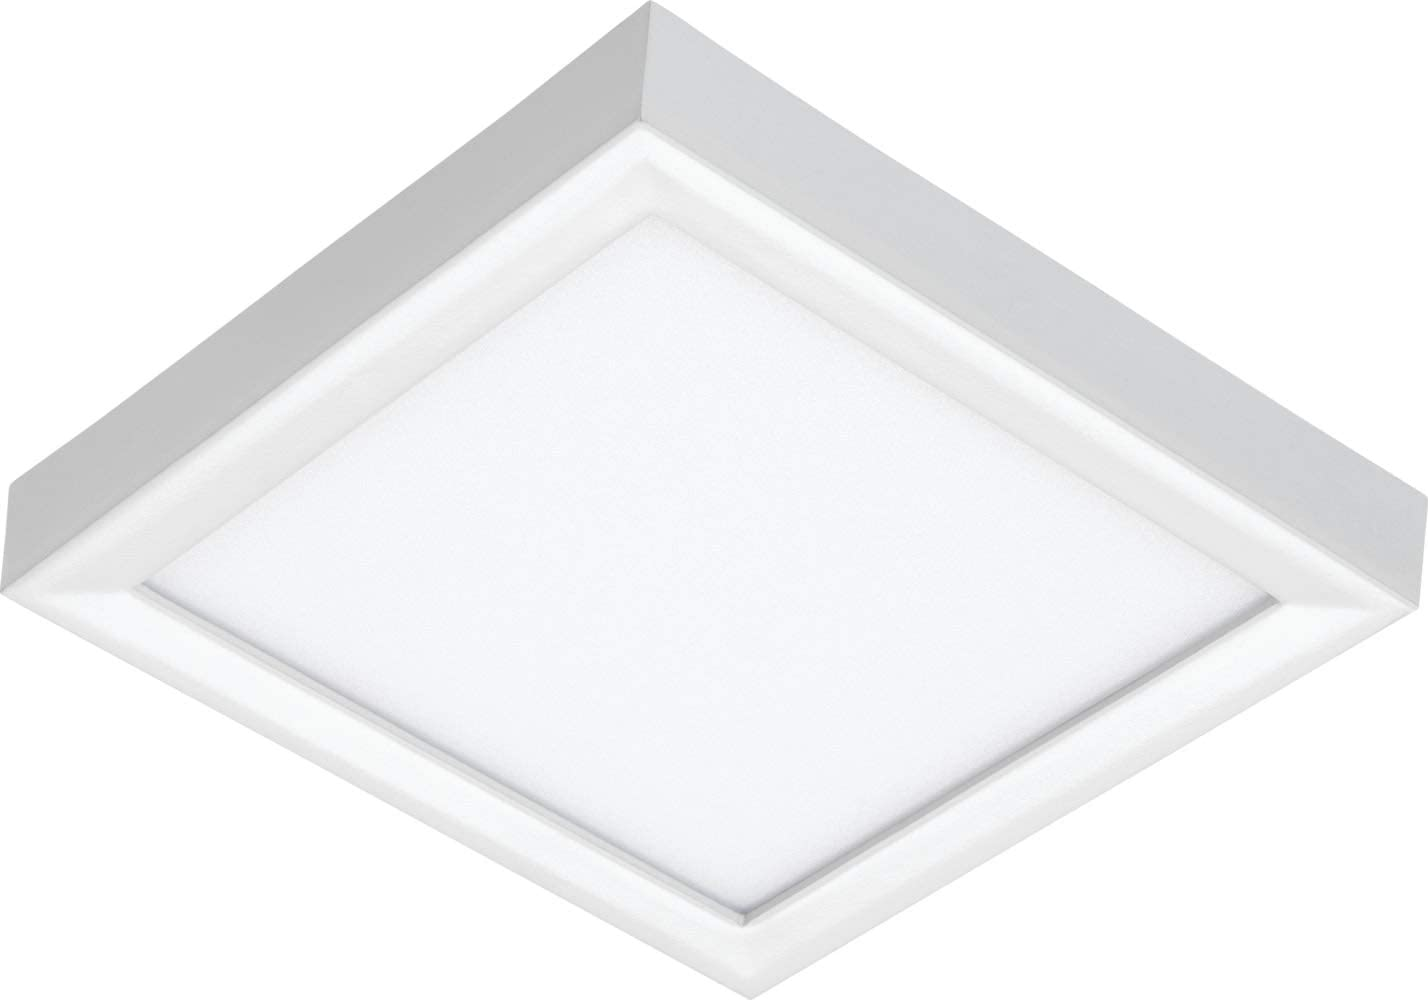 White Juno Lighting JSFSQ 5IN 07LM 40K 90CRI 120 FRPC WH LED Square 5-Inch Slim Form Flush Mount Ceiling Light